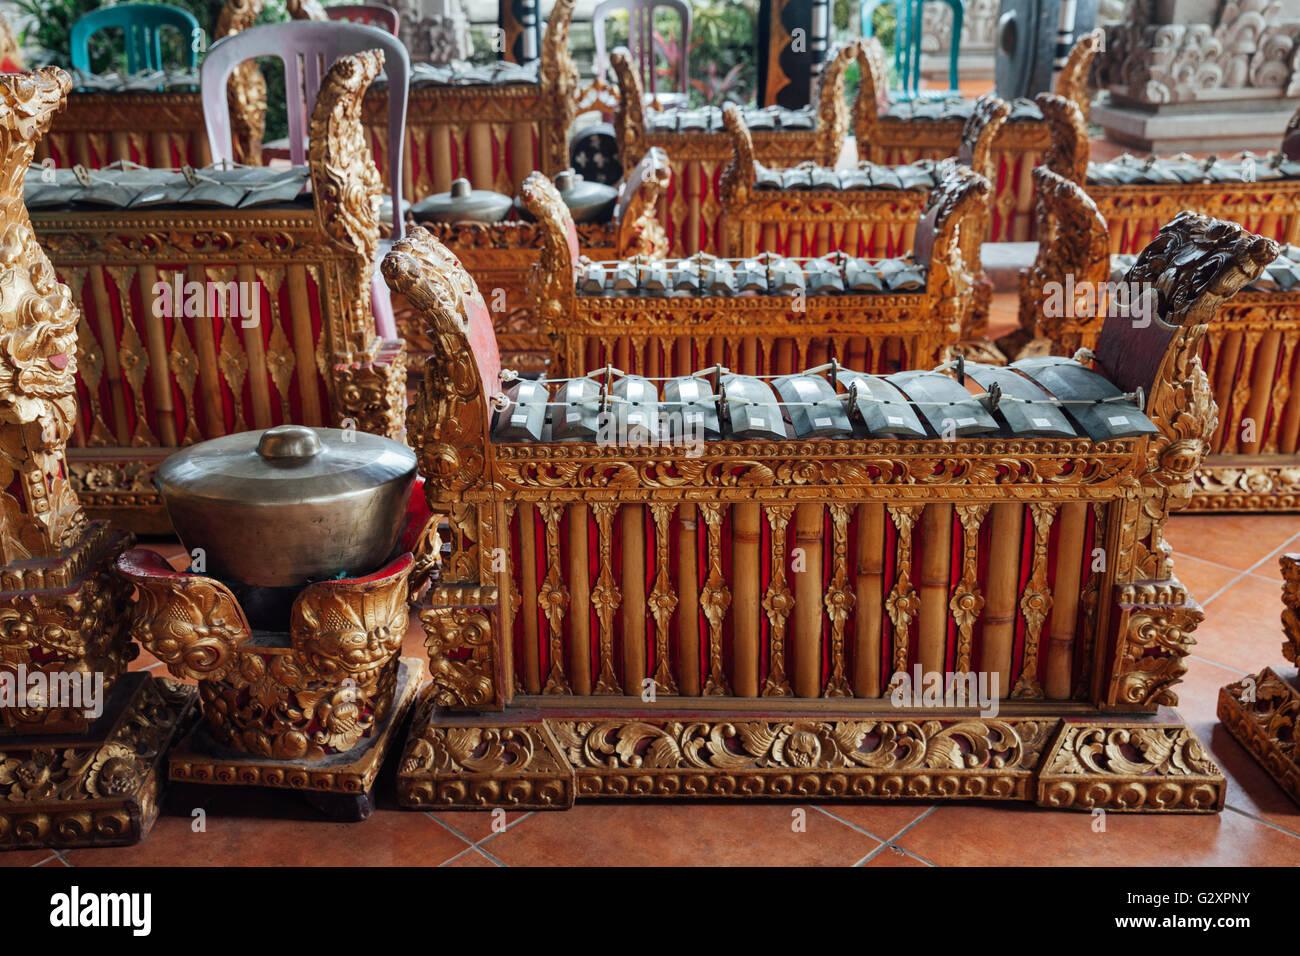 Instruments de musique percussive traditionnelle balinaise 'instruments de gamelan' musique d'ensemble, Photo Stock